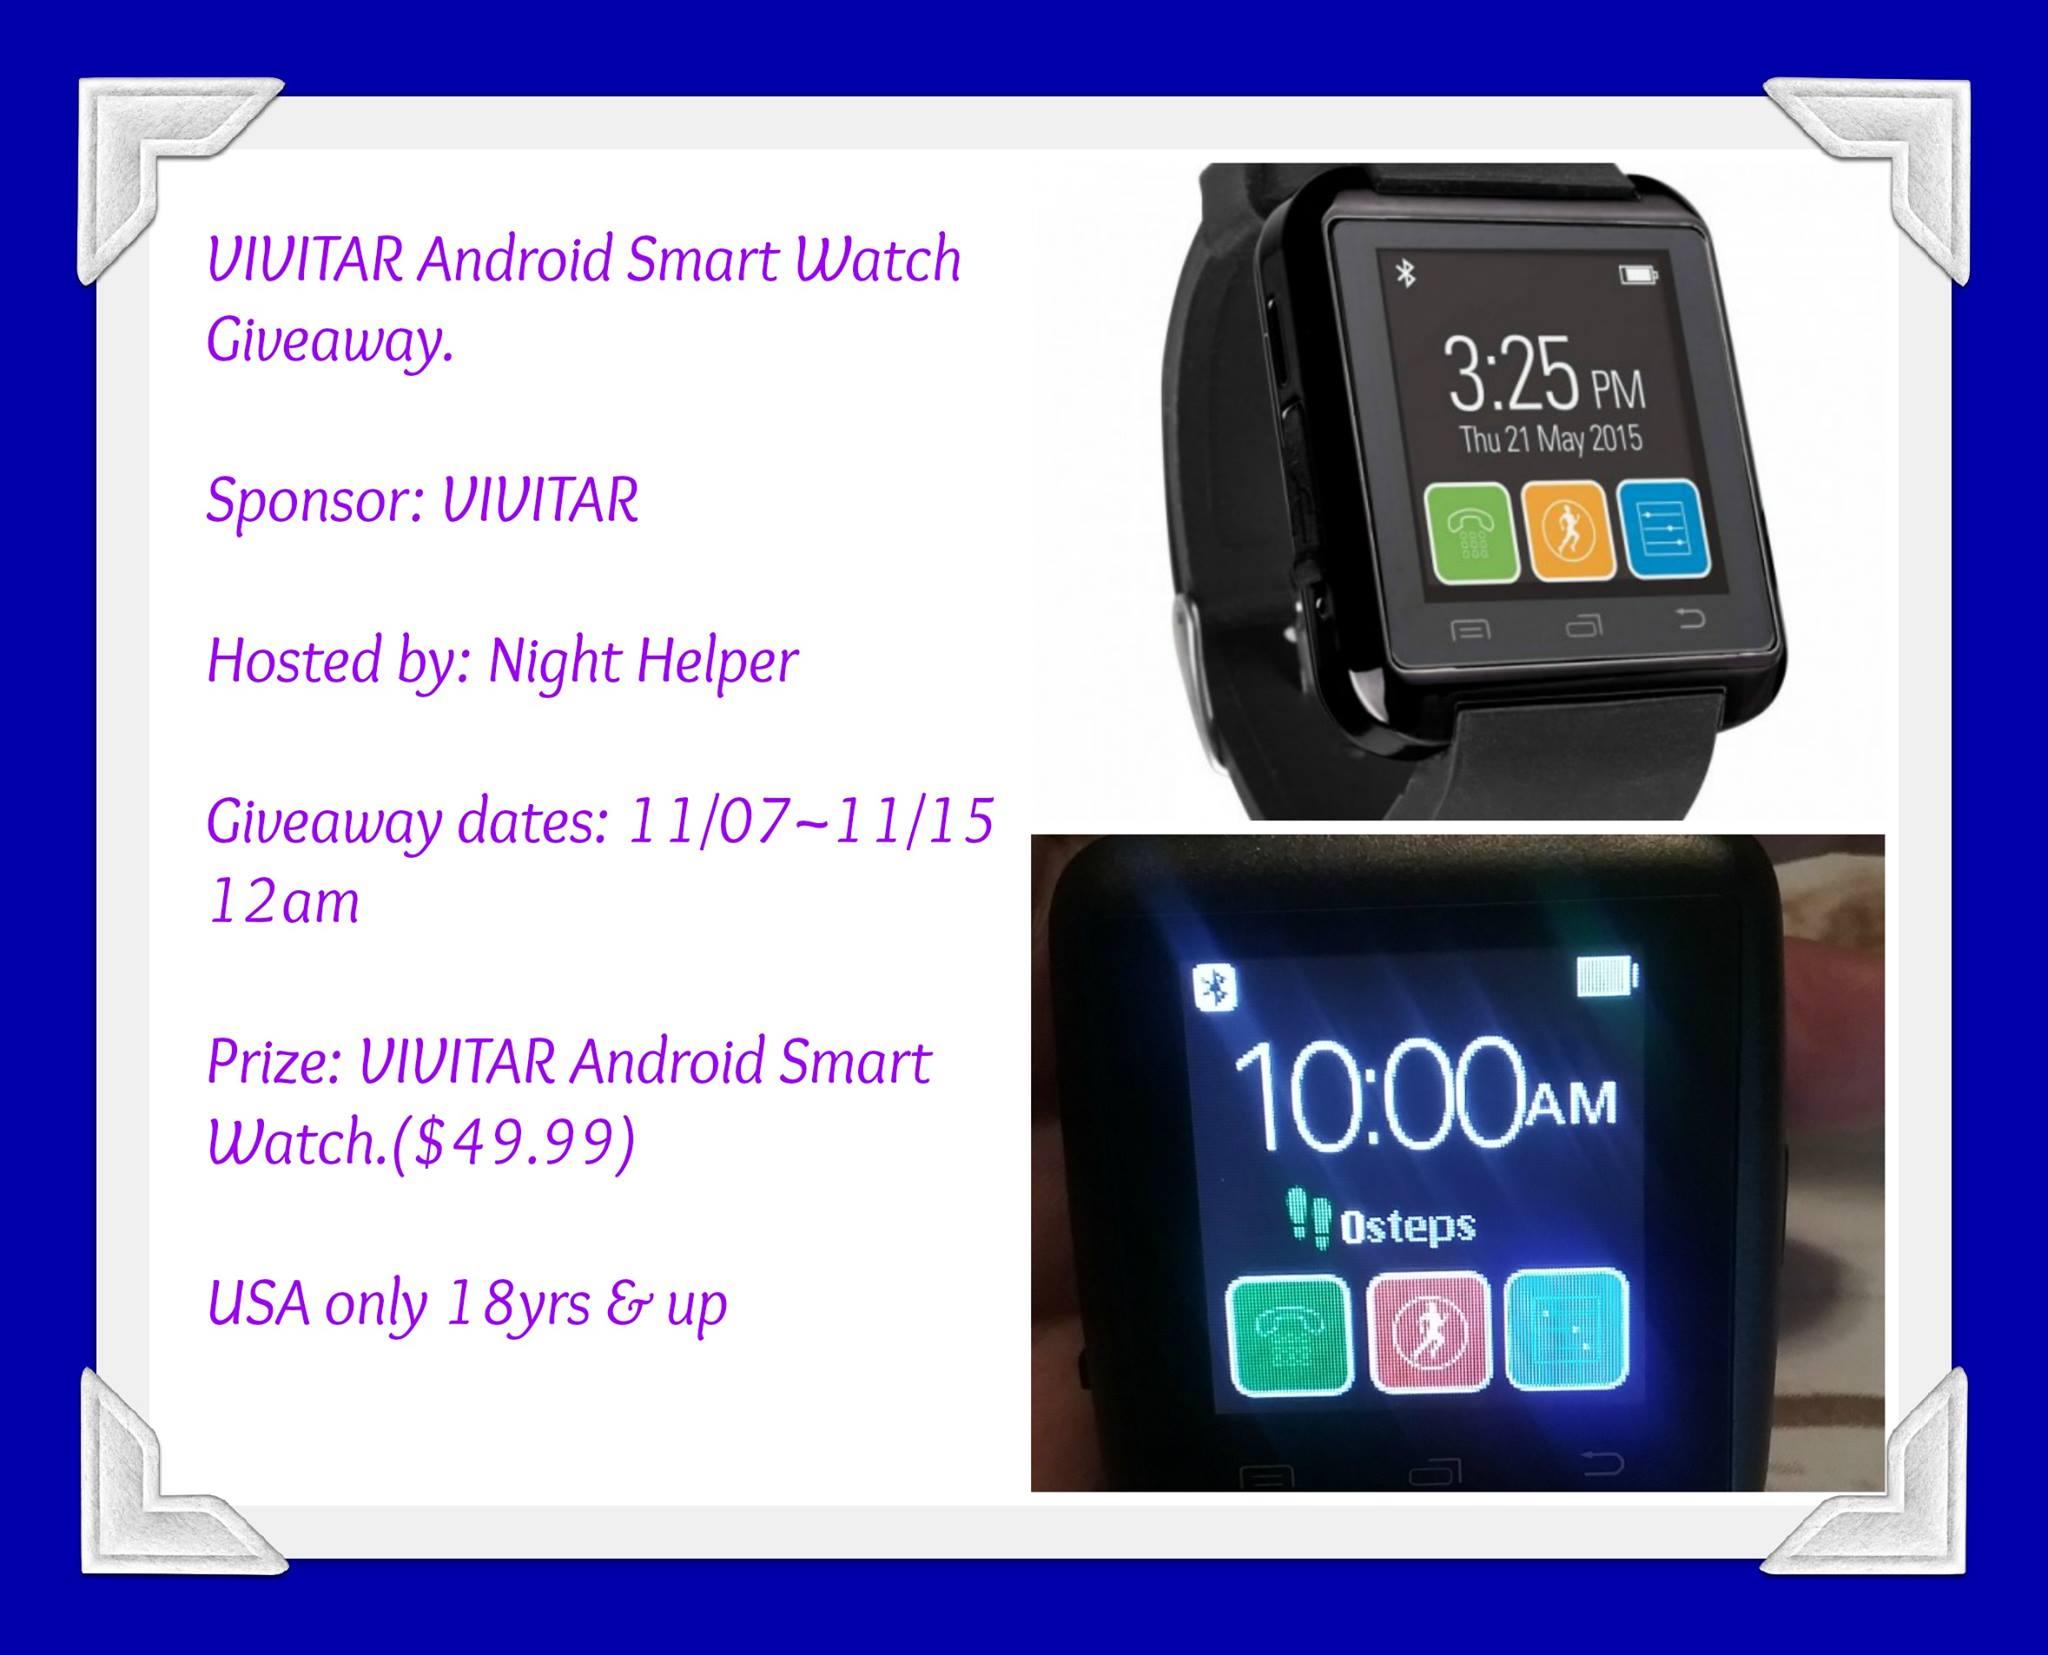 Win a Vivitar Smart Watch